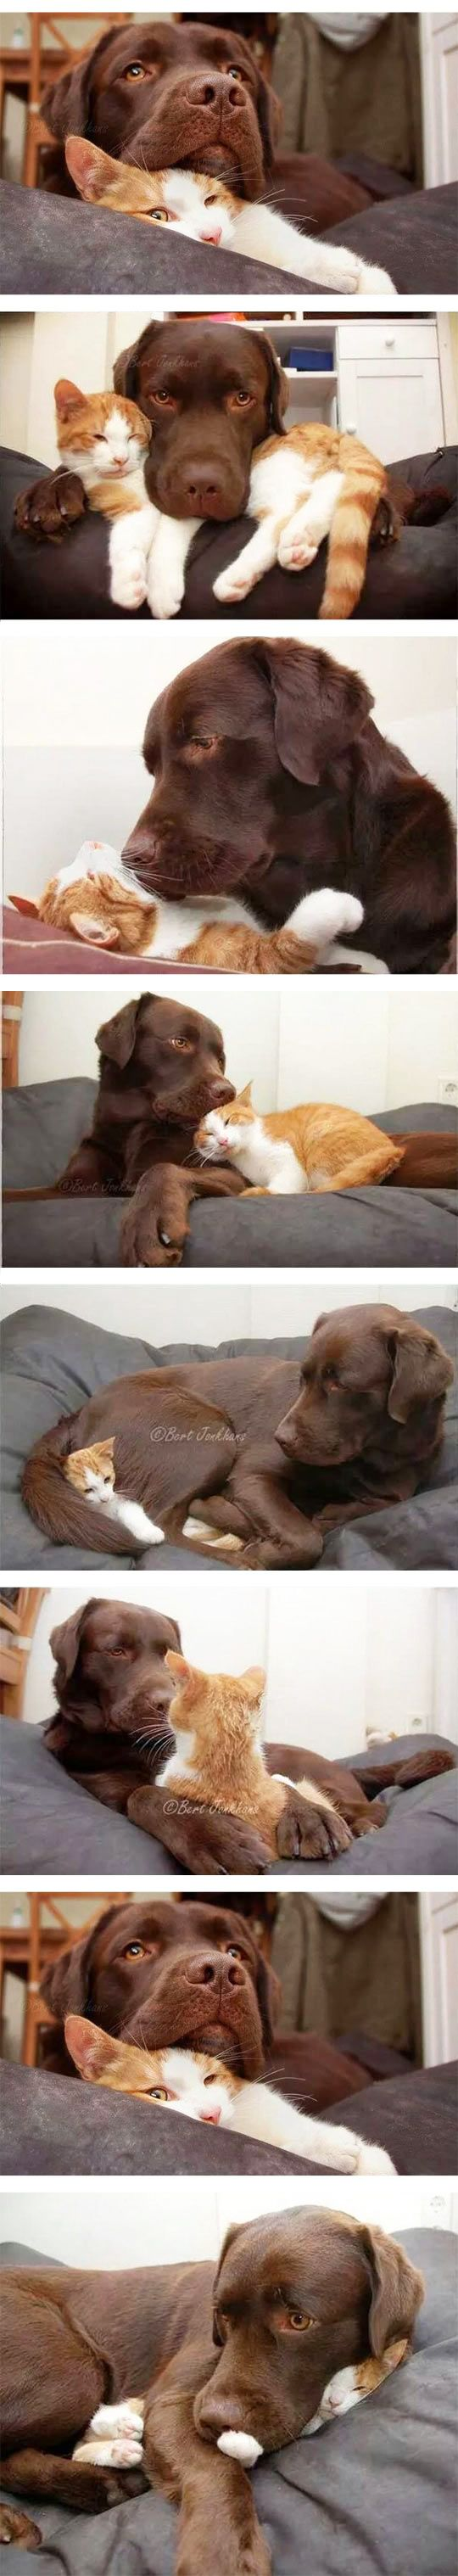 Süß - Hund & Katze  cute animals